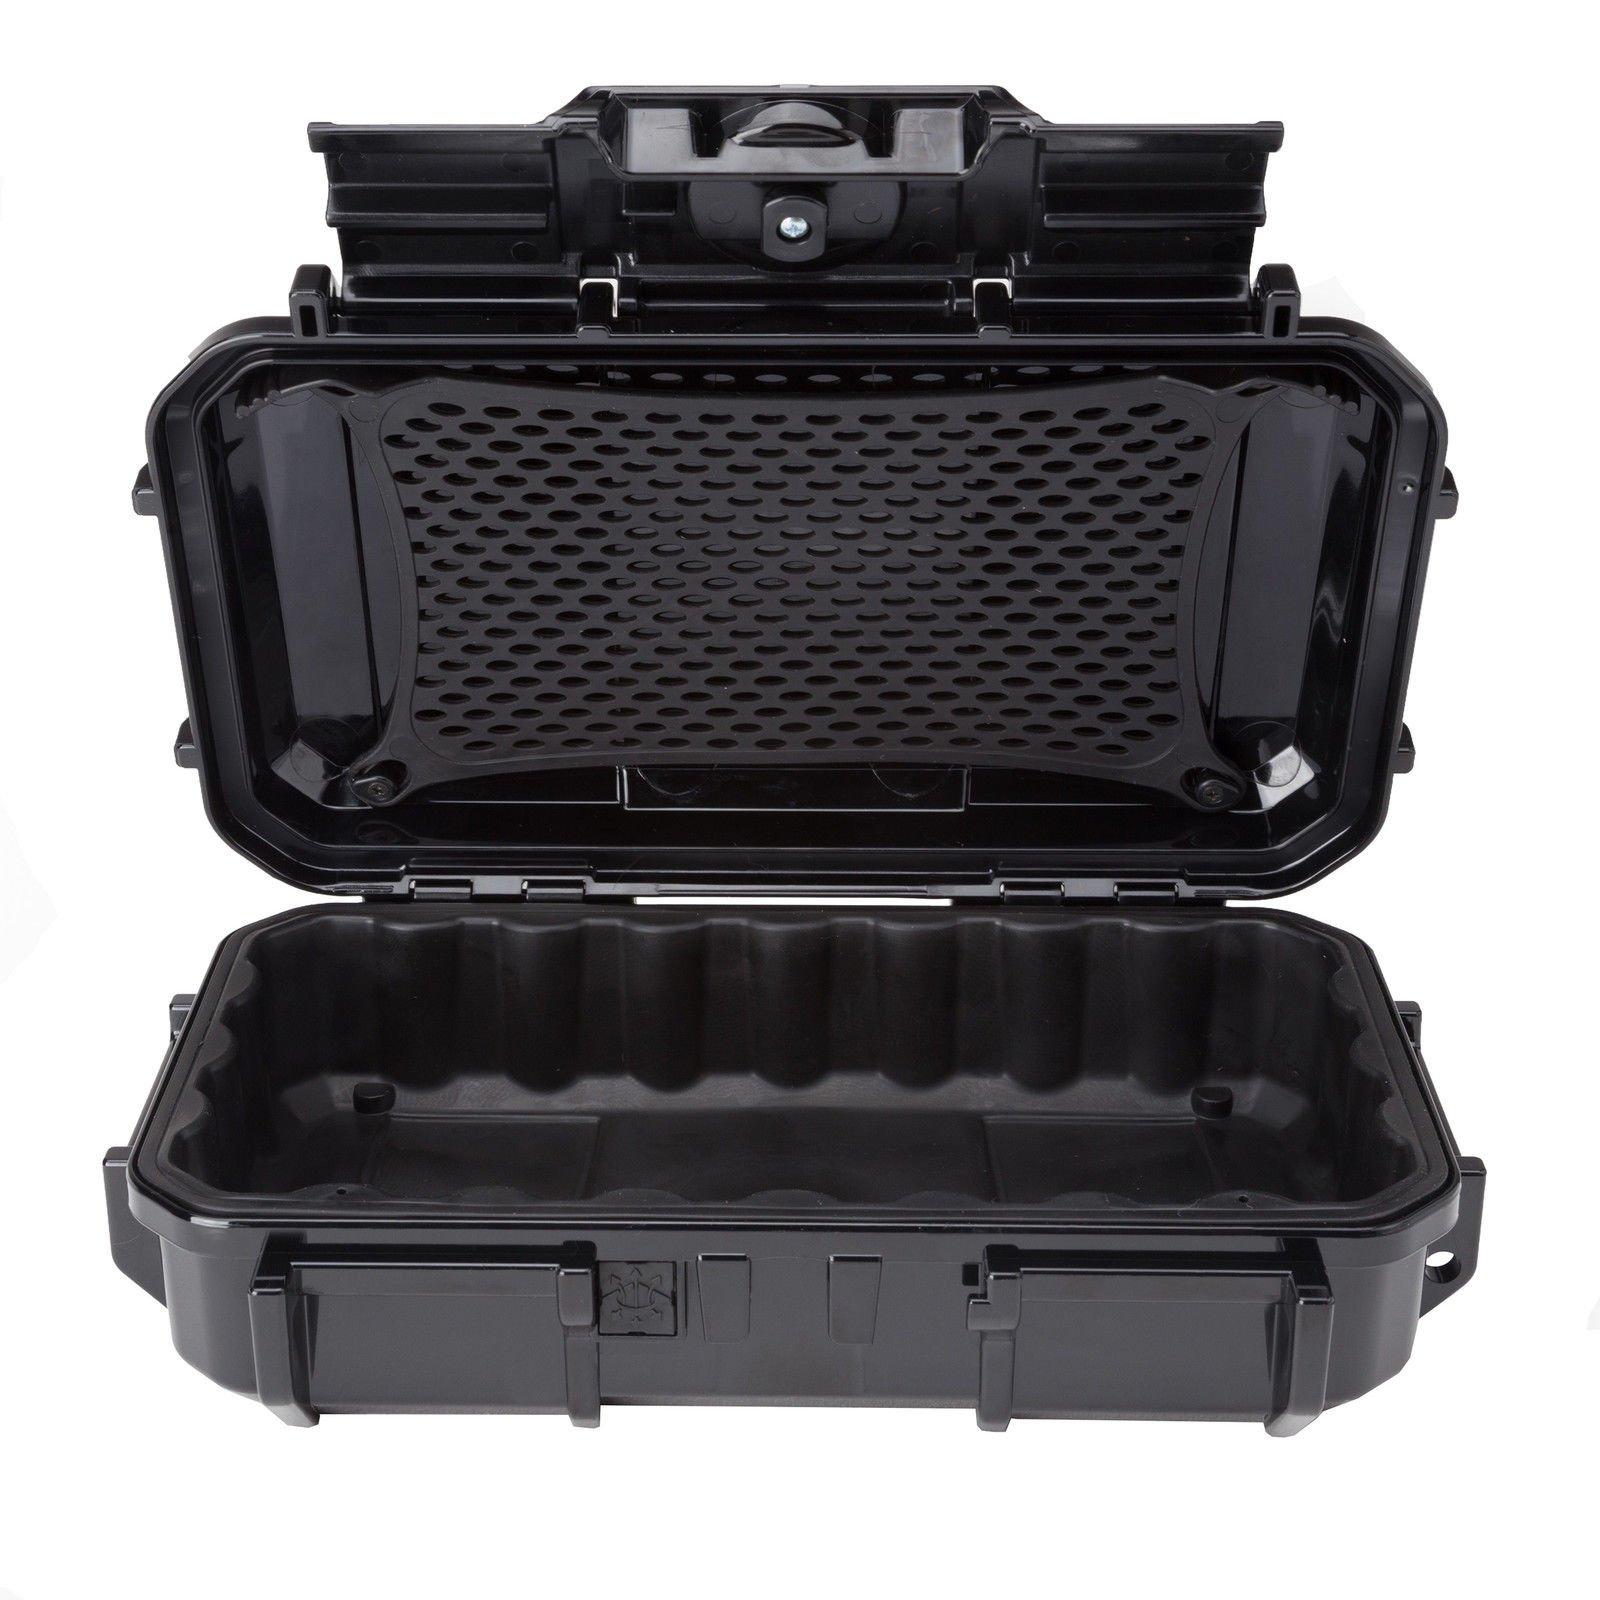 MRT SUPPLY Watertight Crush-Resistant Protective Micro Storage Case, Black Ebook